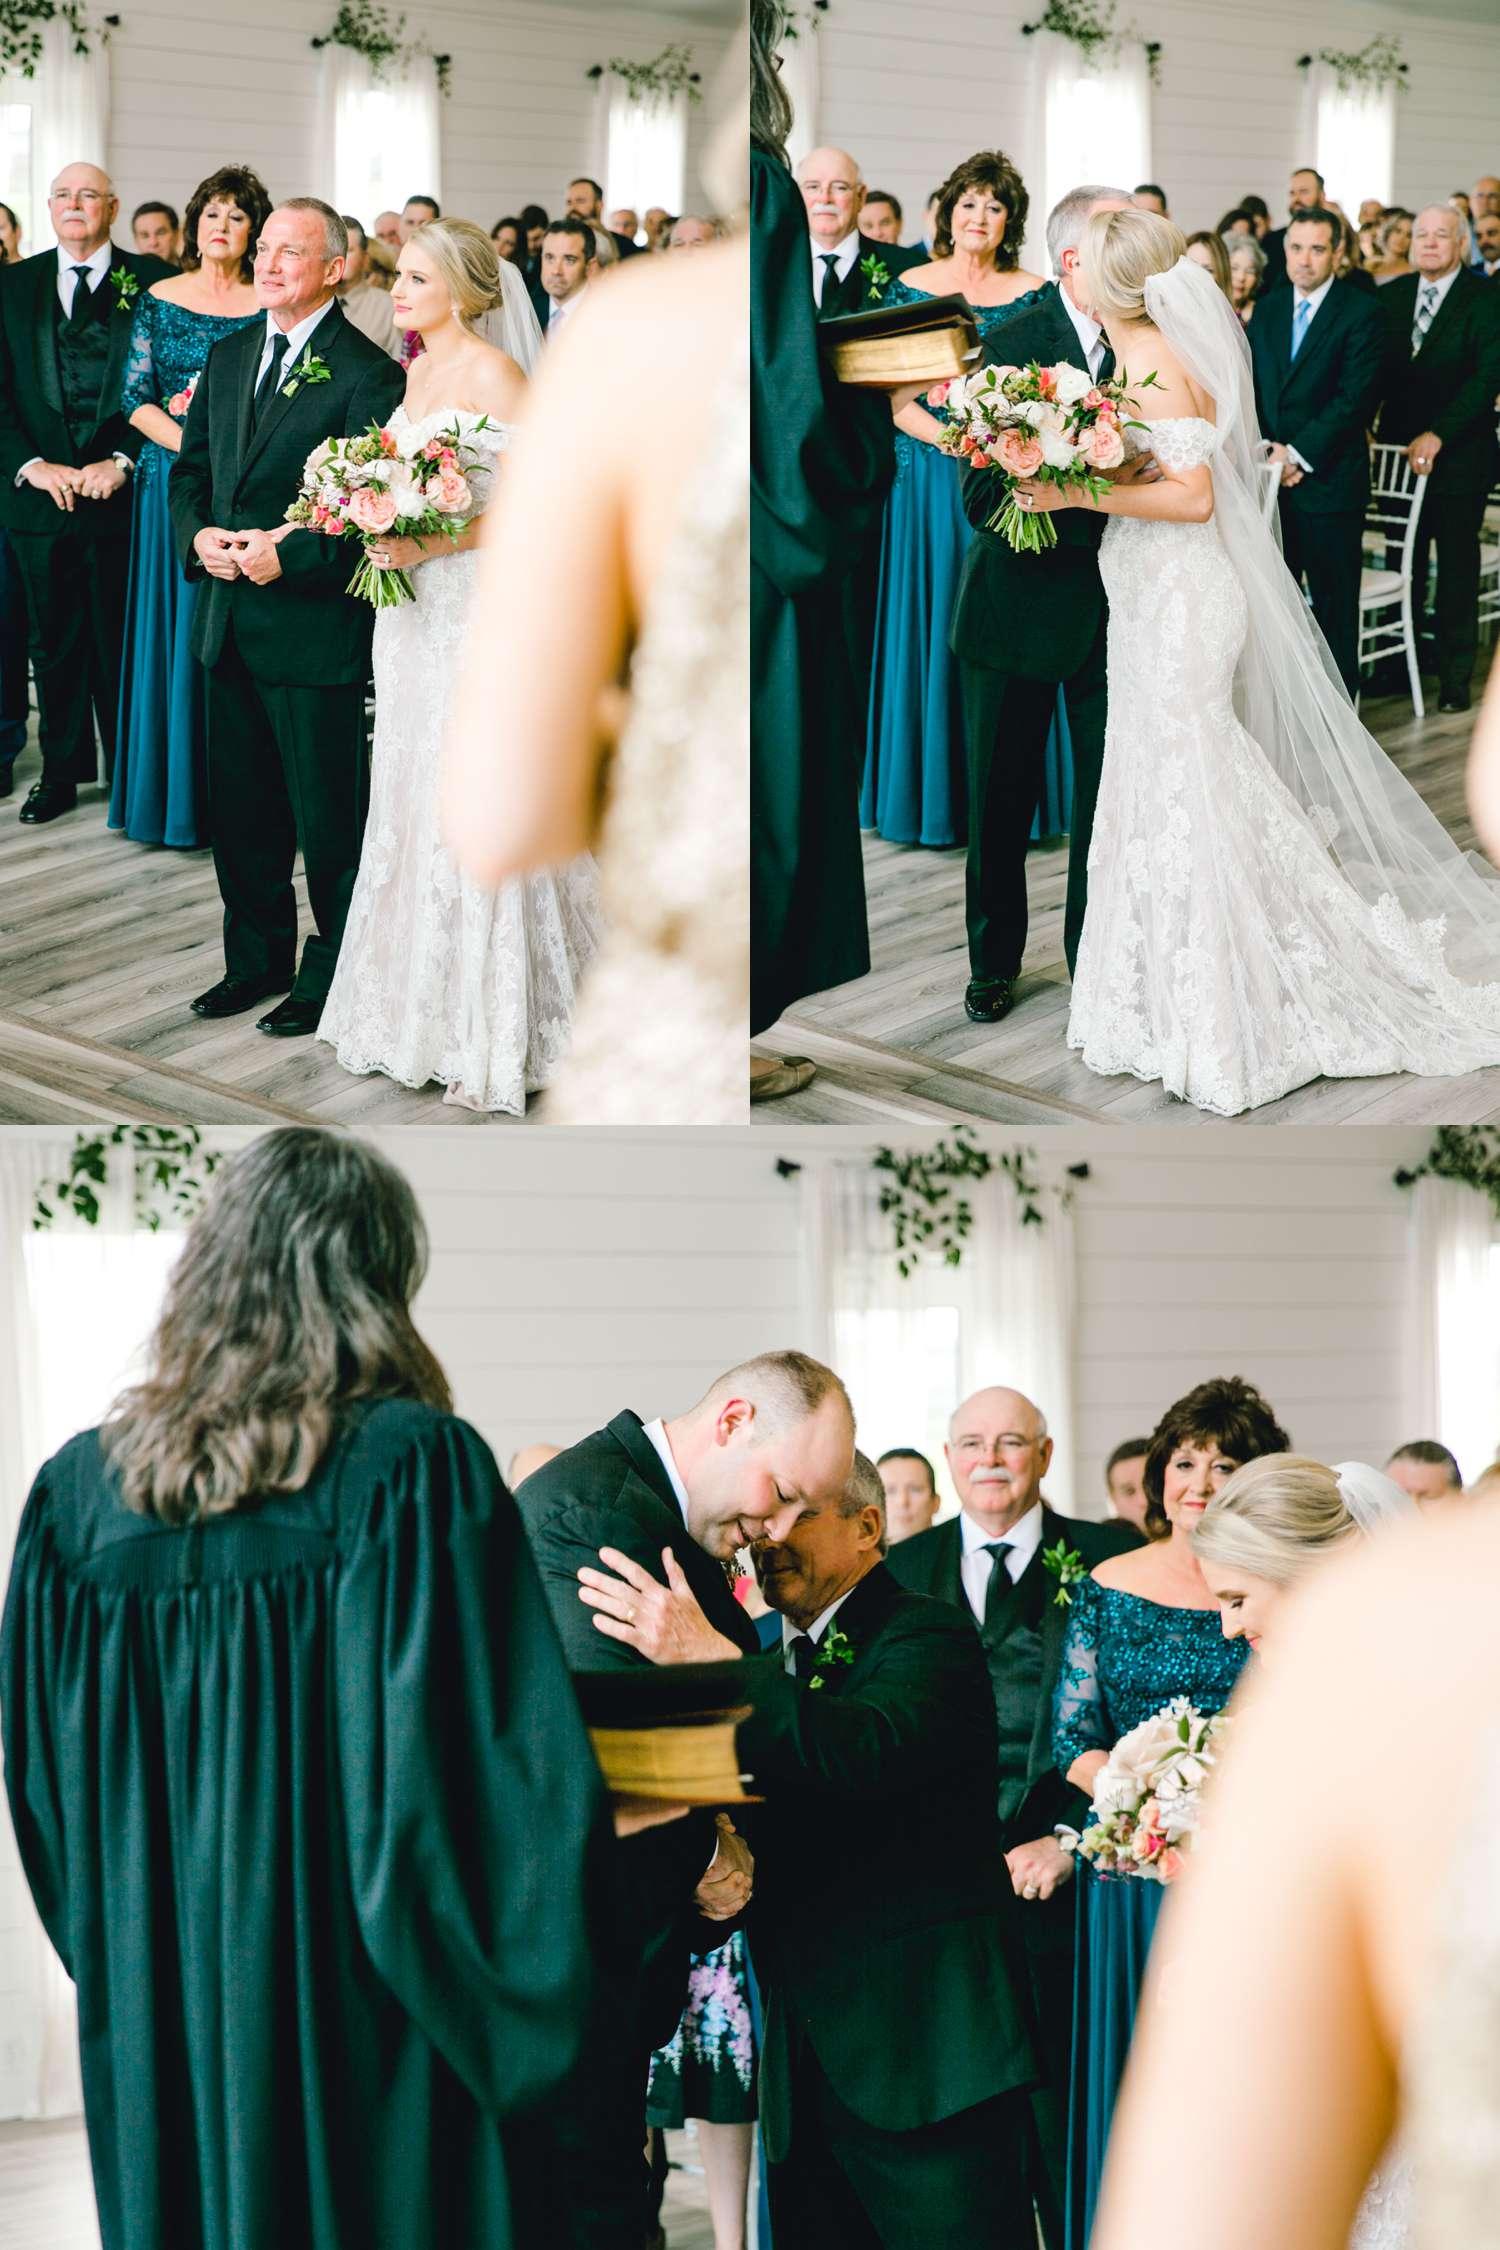 HEBERT_MORGAN_AND_CLAY_ALLEEJ_THE_FARMHOUSE_MONTGOMERY_TEXAS_WEDDING_0084.jpg